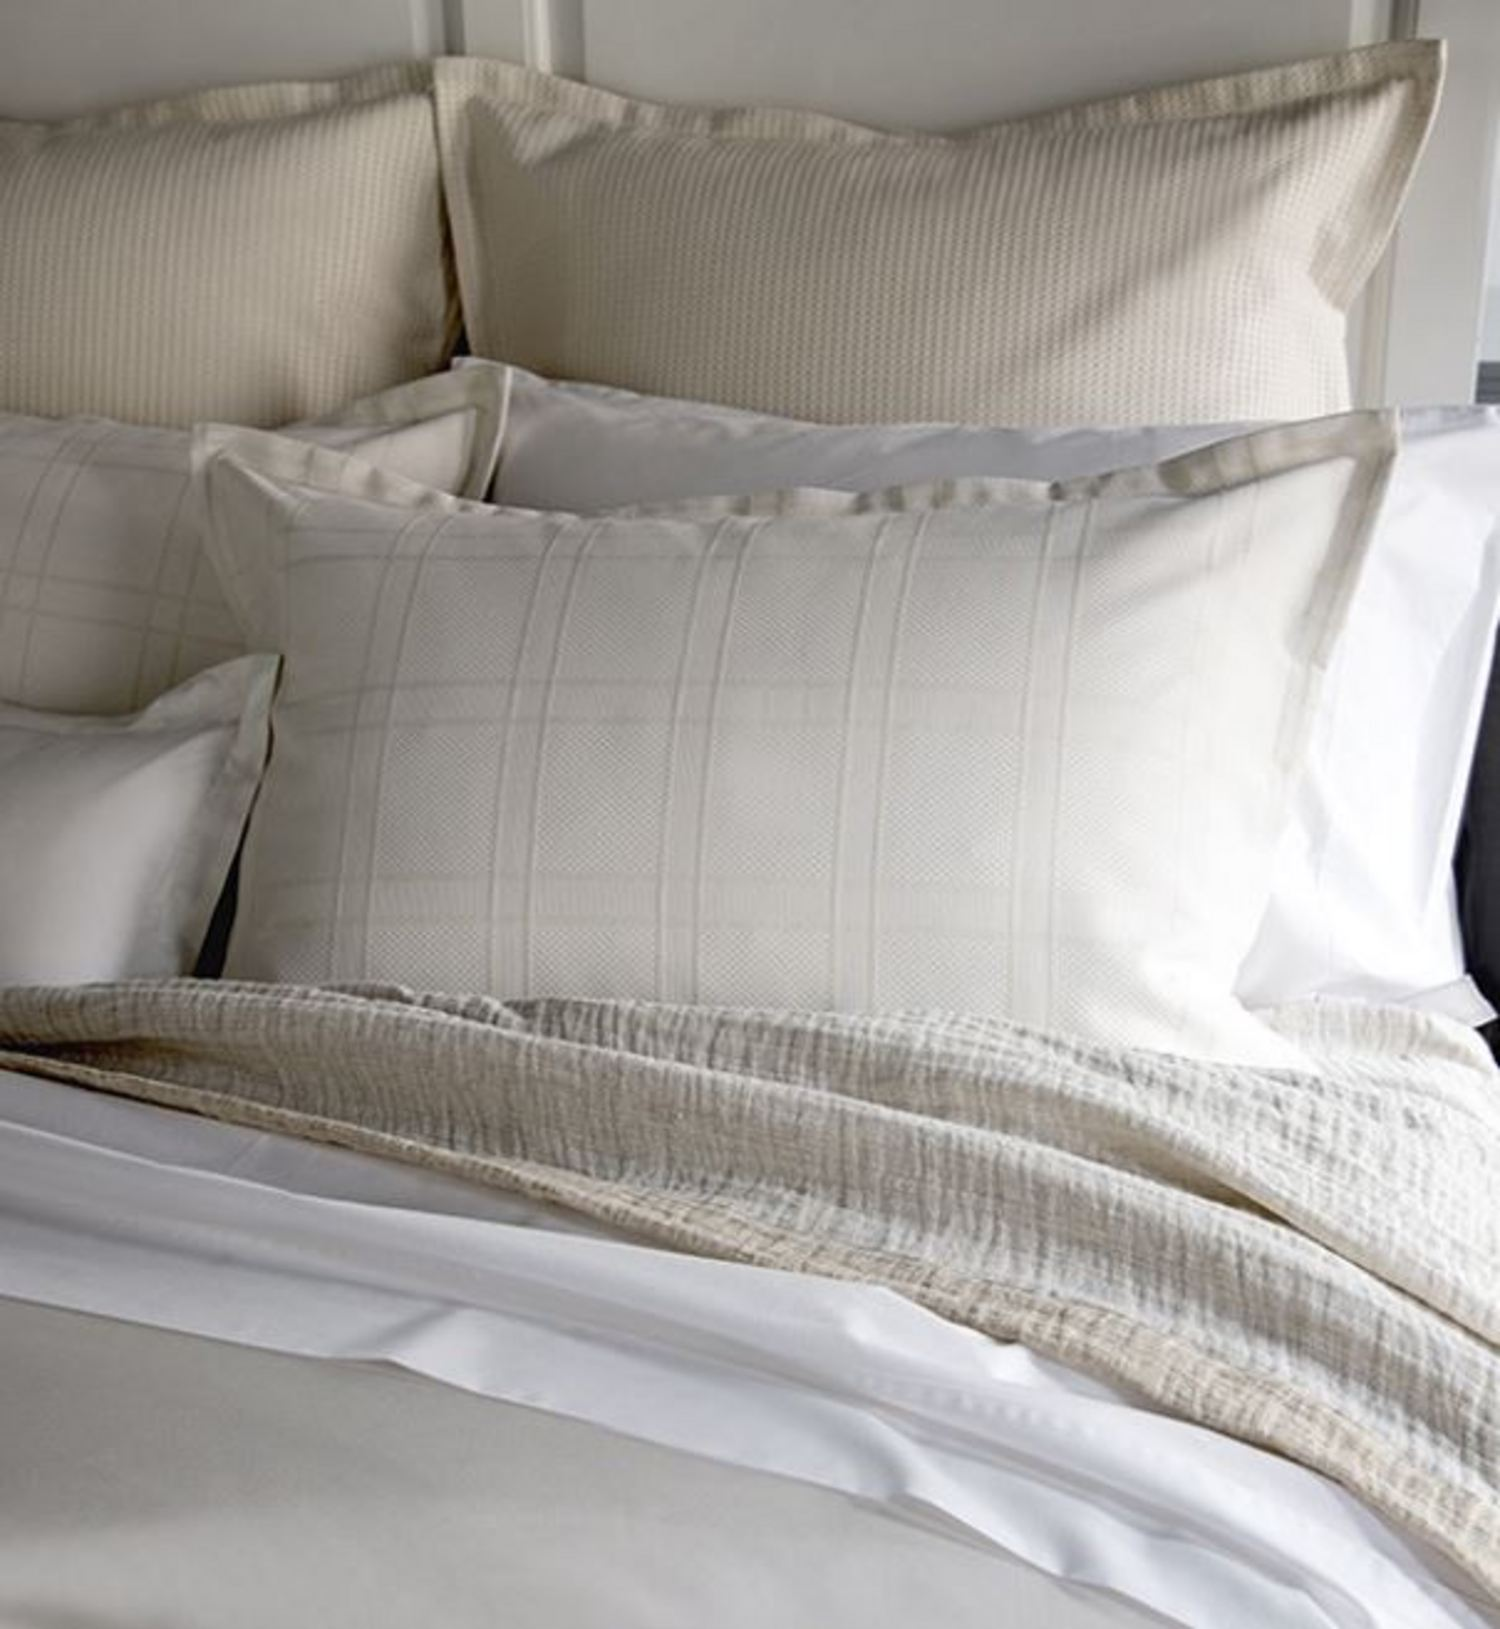 pillow insert pack for 3 euro shams beddingsuperstorecom With euro sham insert 28x28